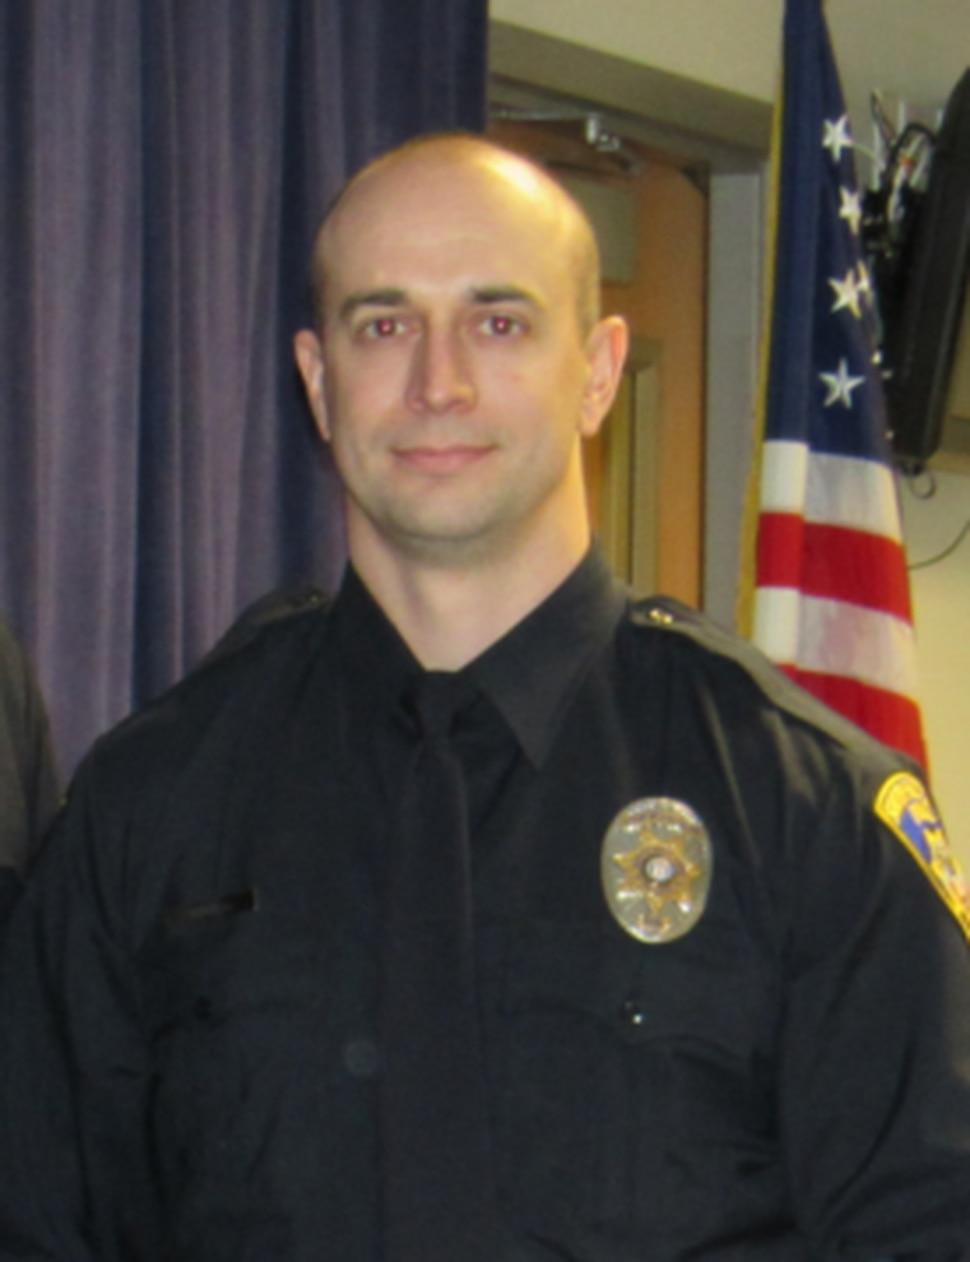 (Photo courtesy of South Salt Lake Police Department) Officer David Romrell